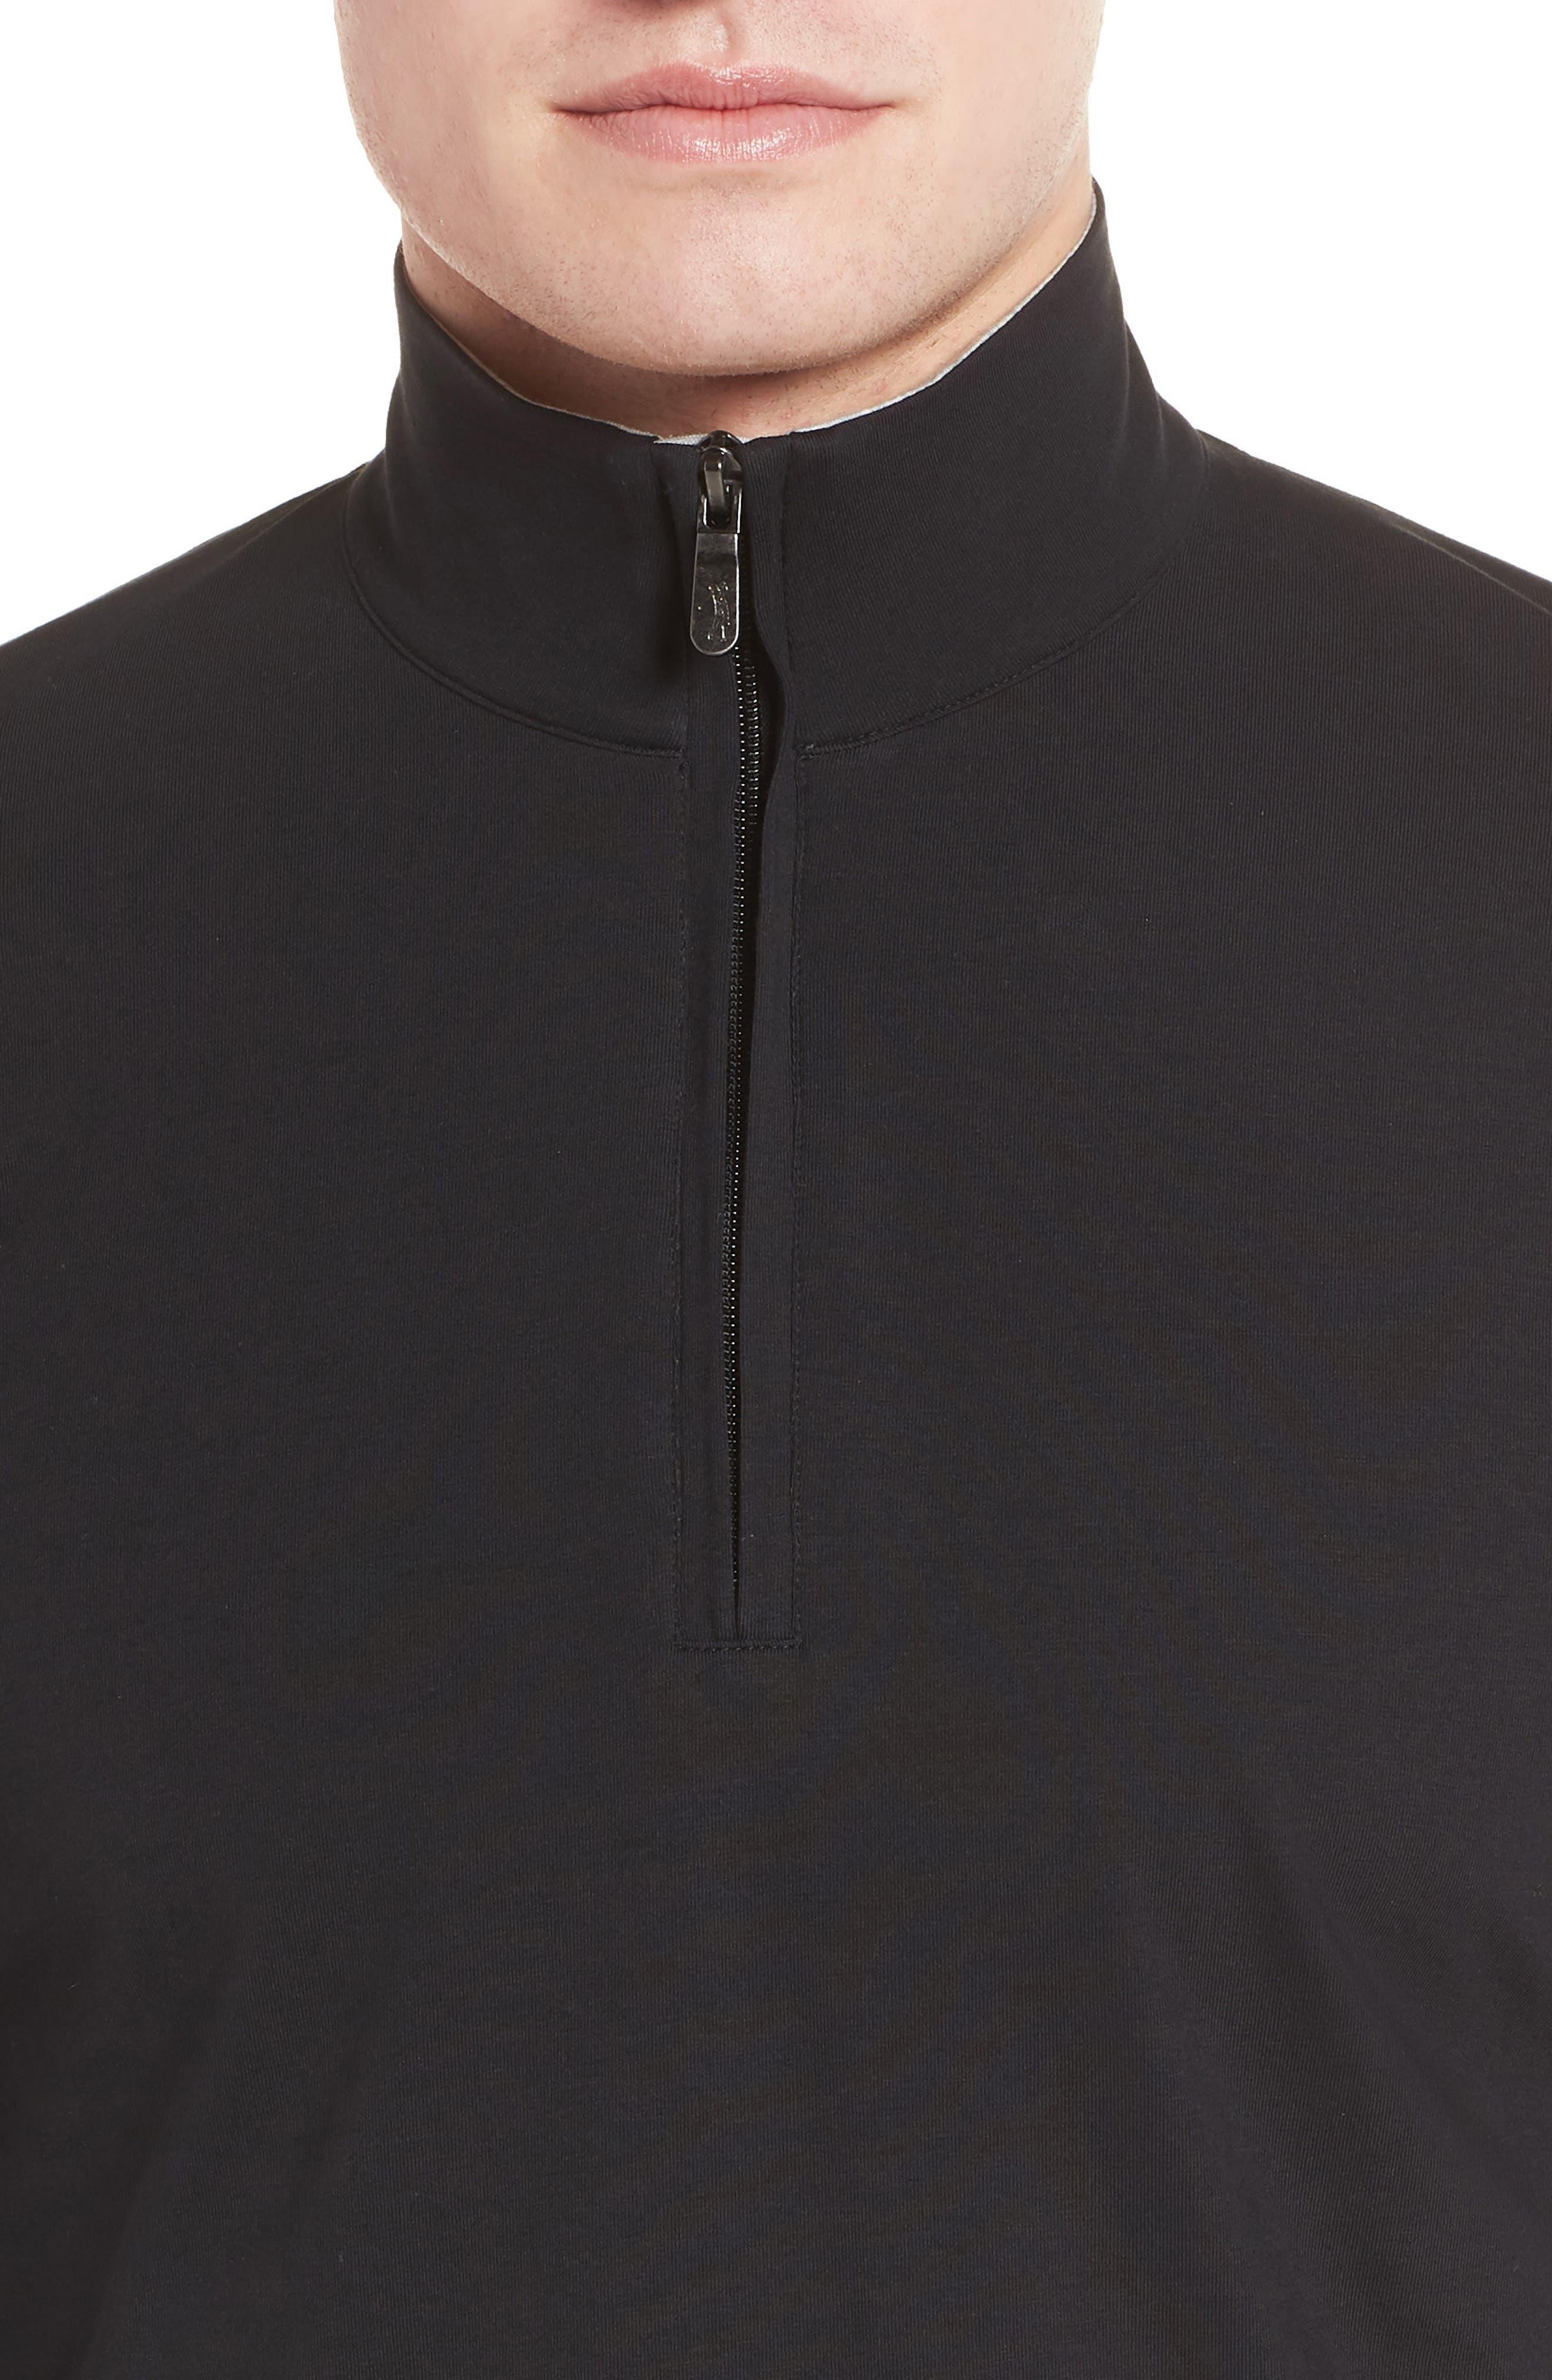 PTO Liquid Stretch Quarter Zip Pullover,                             Alternate thumbnail 4, color,                             BLACK